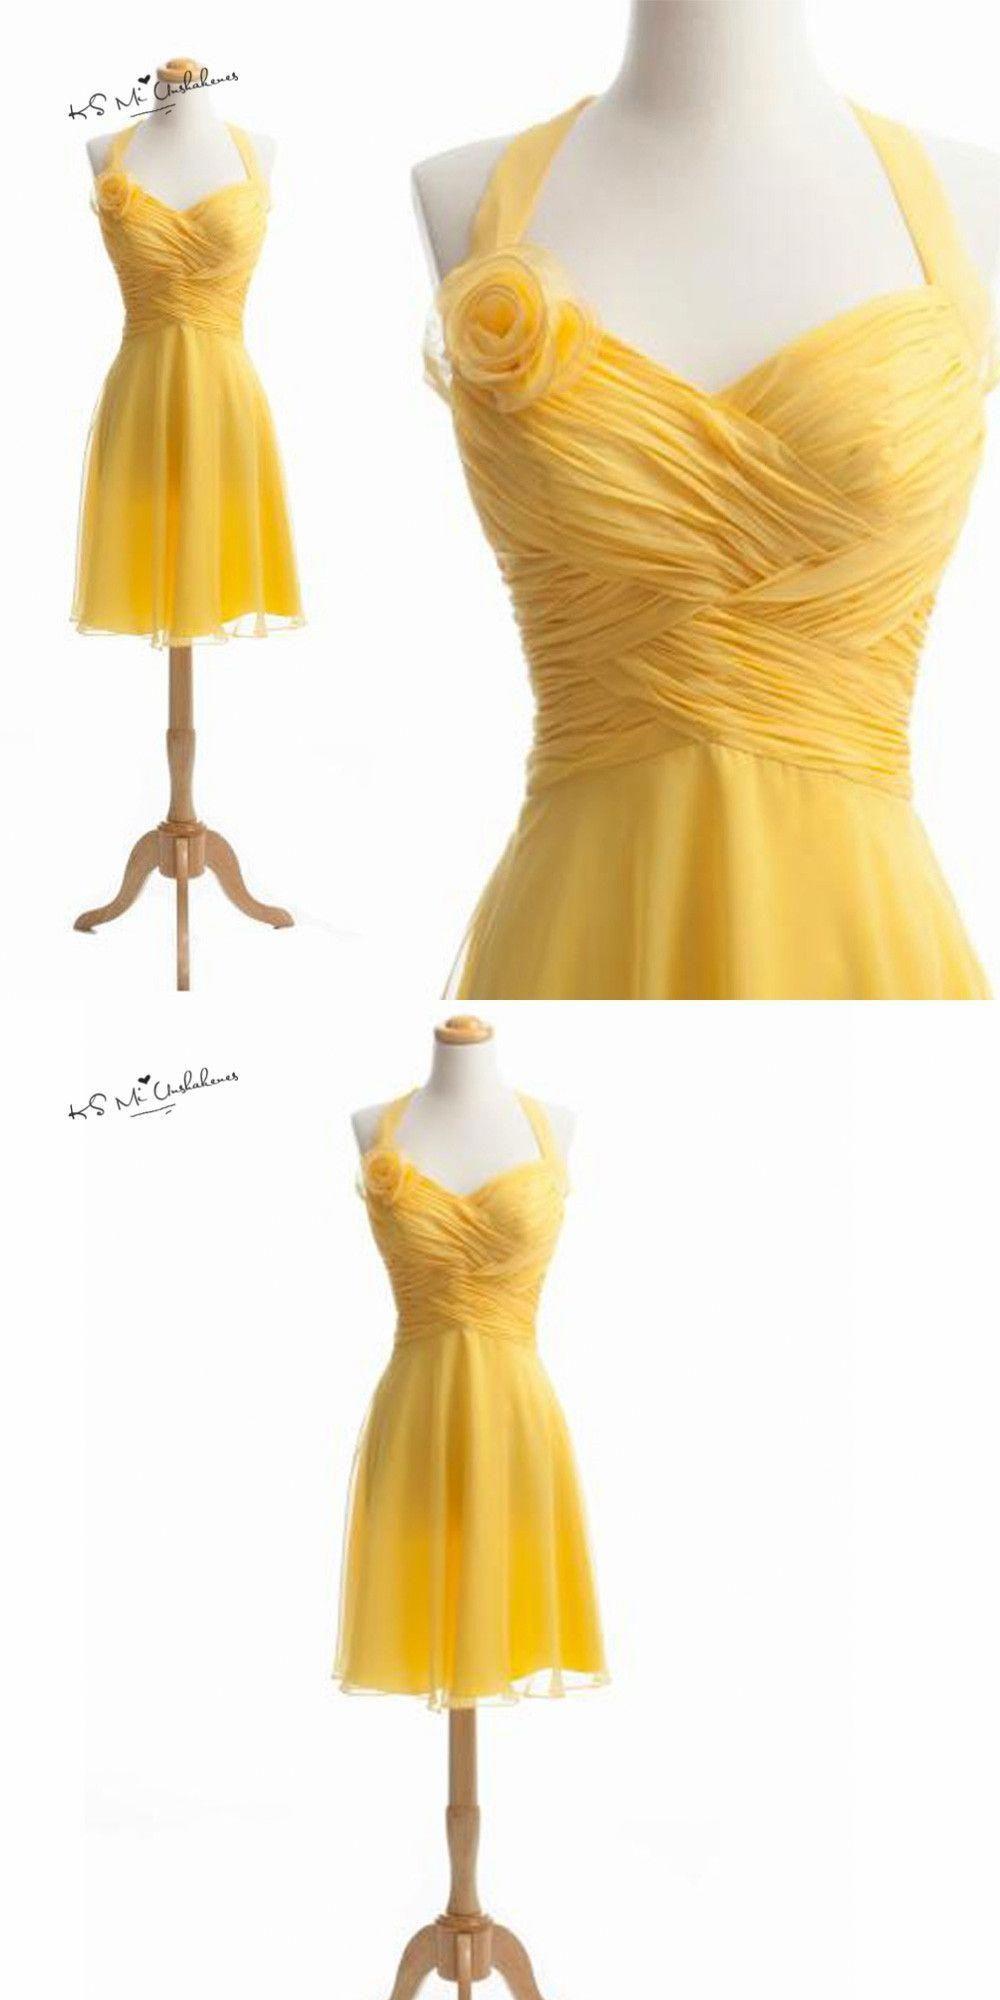 Yellow Bridesmaid Dresses Halter Flowers Short Wedding Guest Dress To Par Yellow Bridesmaid Dresses Yellow Bridesmaid Dresses Short Short Wedding Guest Dresses [ 2000 x 1000 Pixel ]